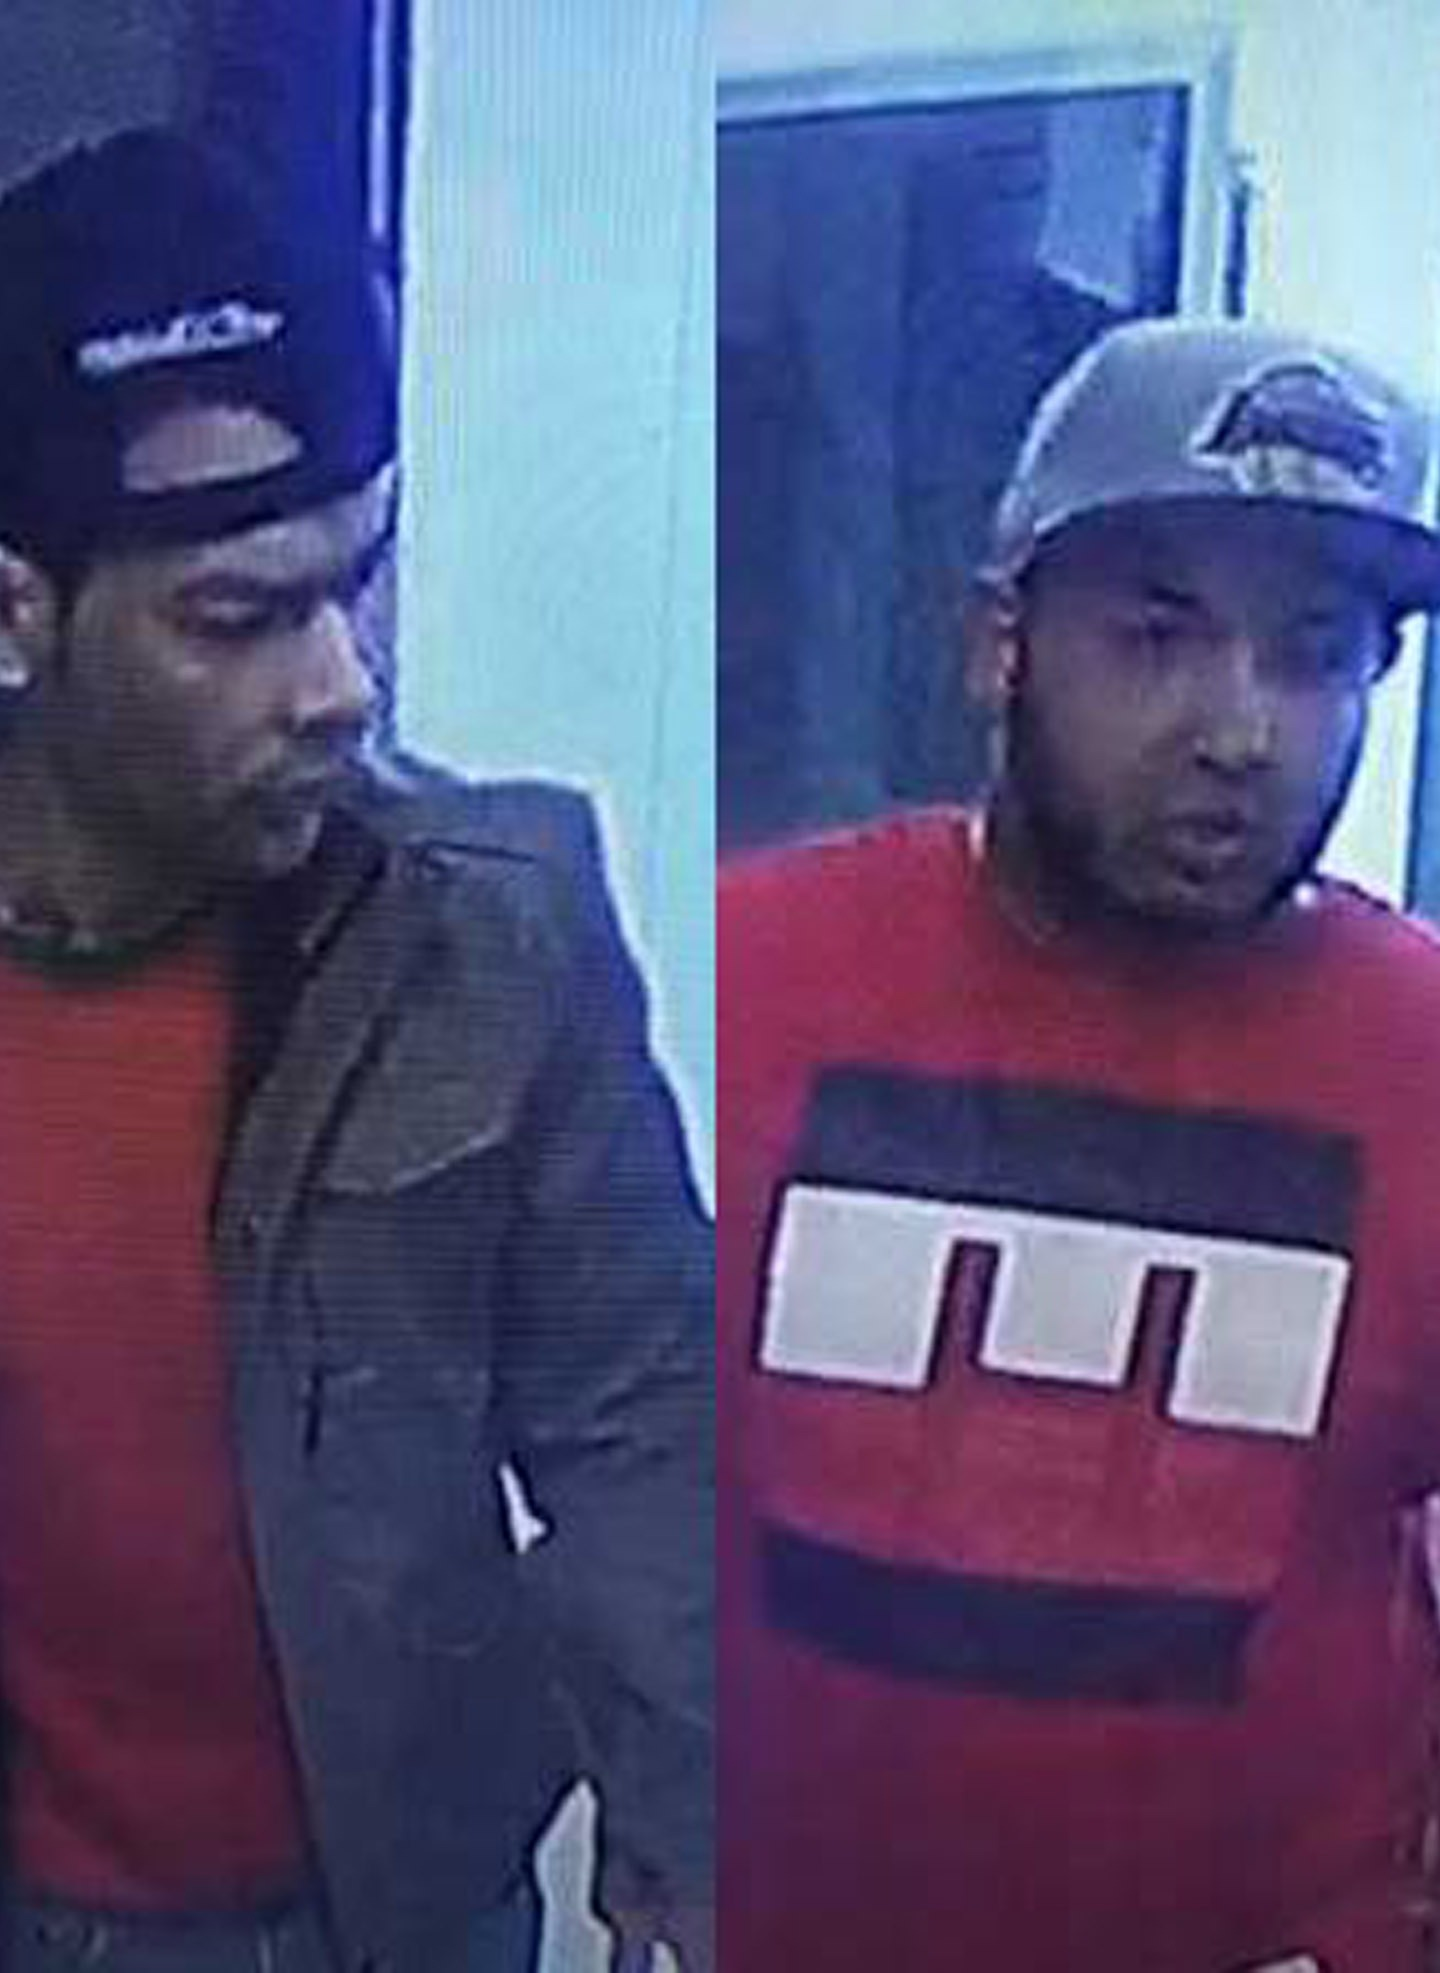 Watertown police seek 2 following liquor store burglary